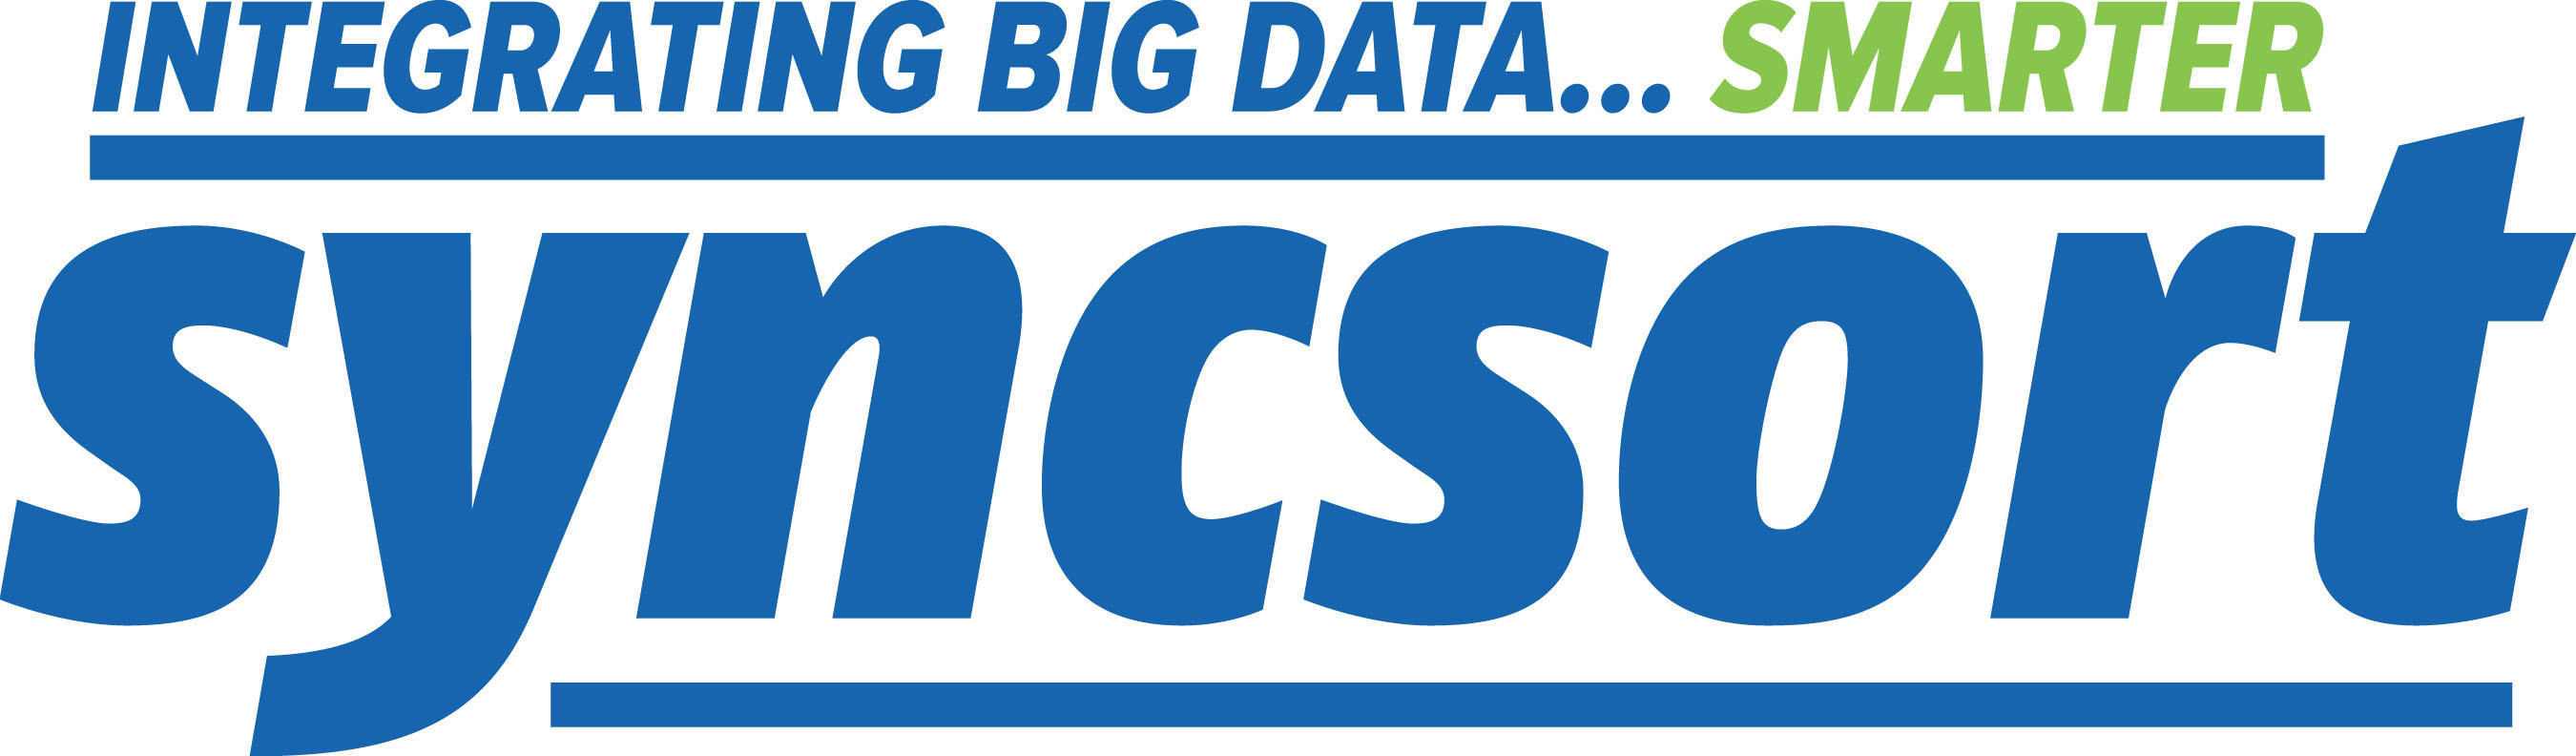 SYNCSORT DATA INTEGRATION LOGO